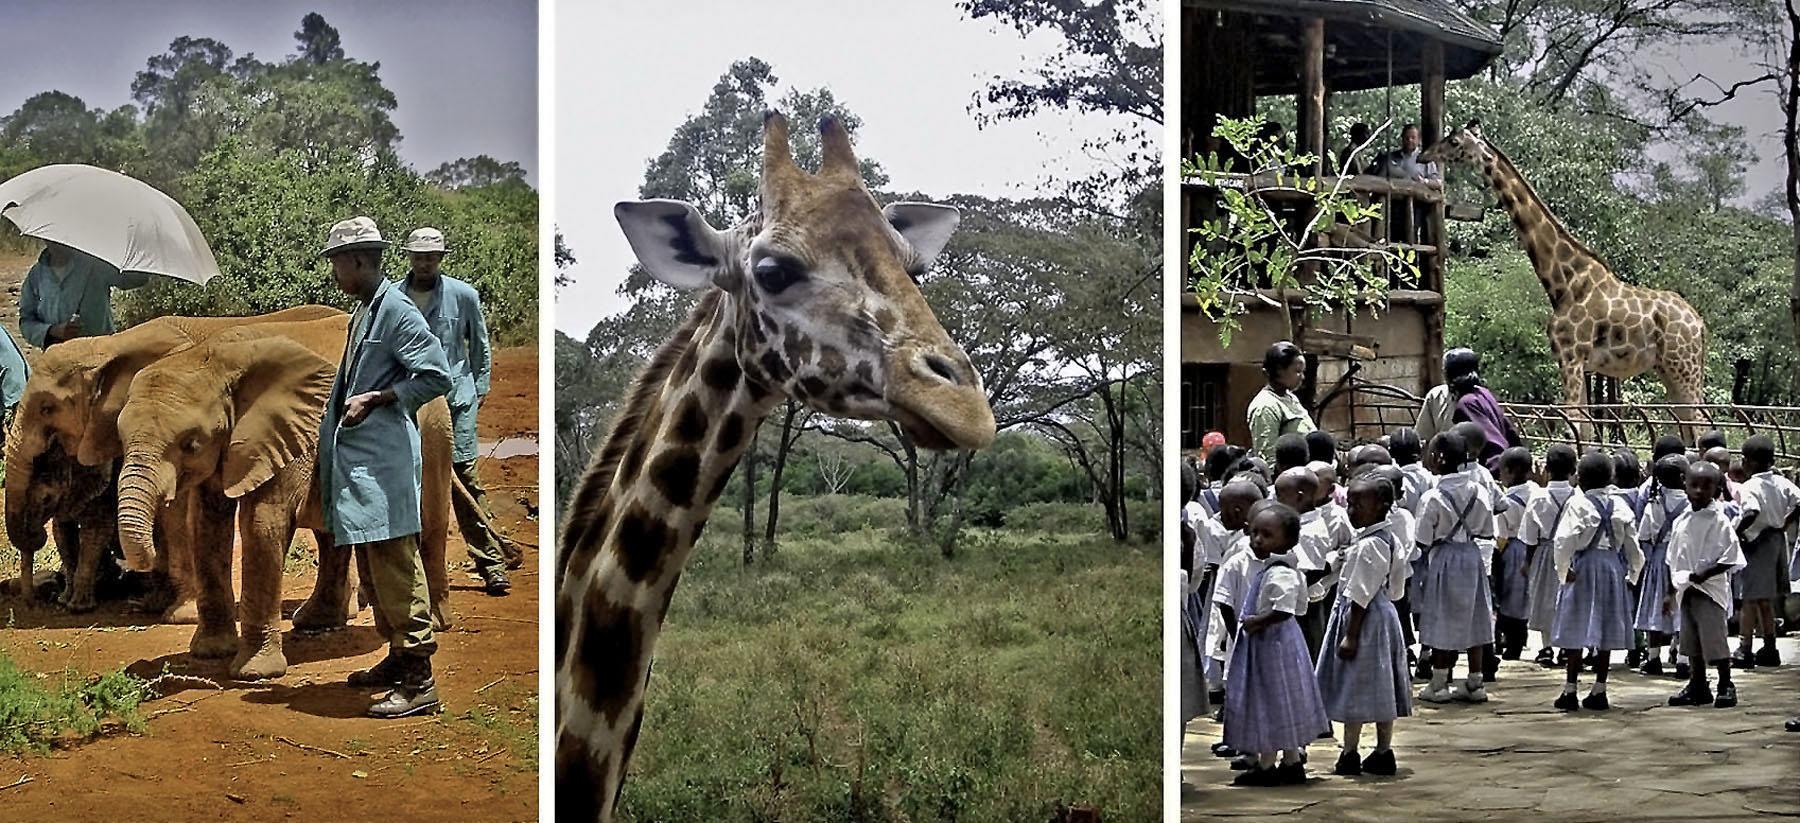 Africa Kenya Nairobi Sheldrick Elephant Orphanage Giraffe Centre